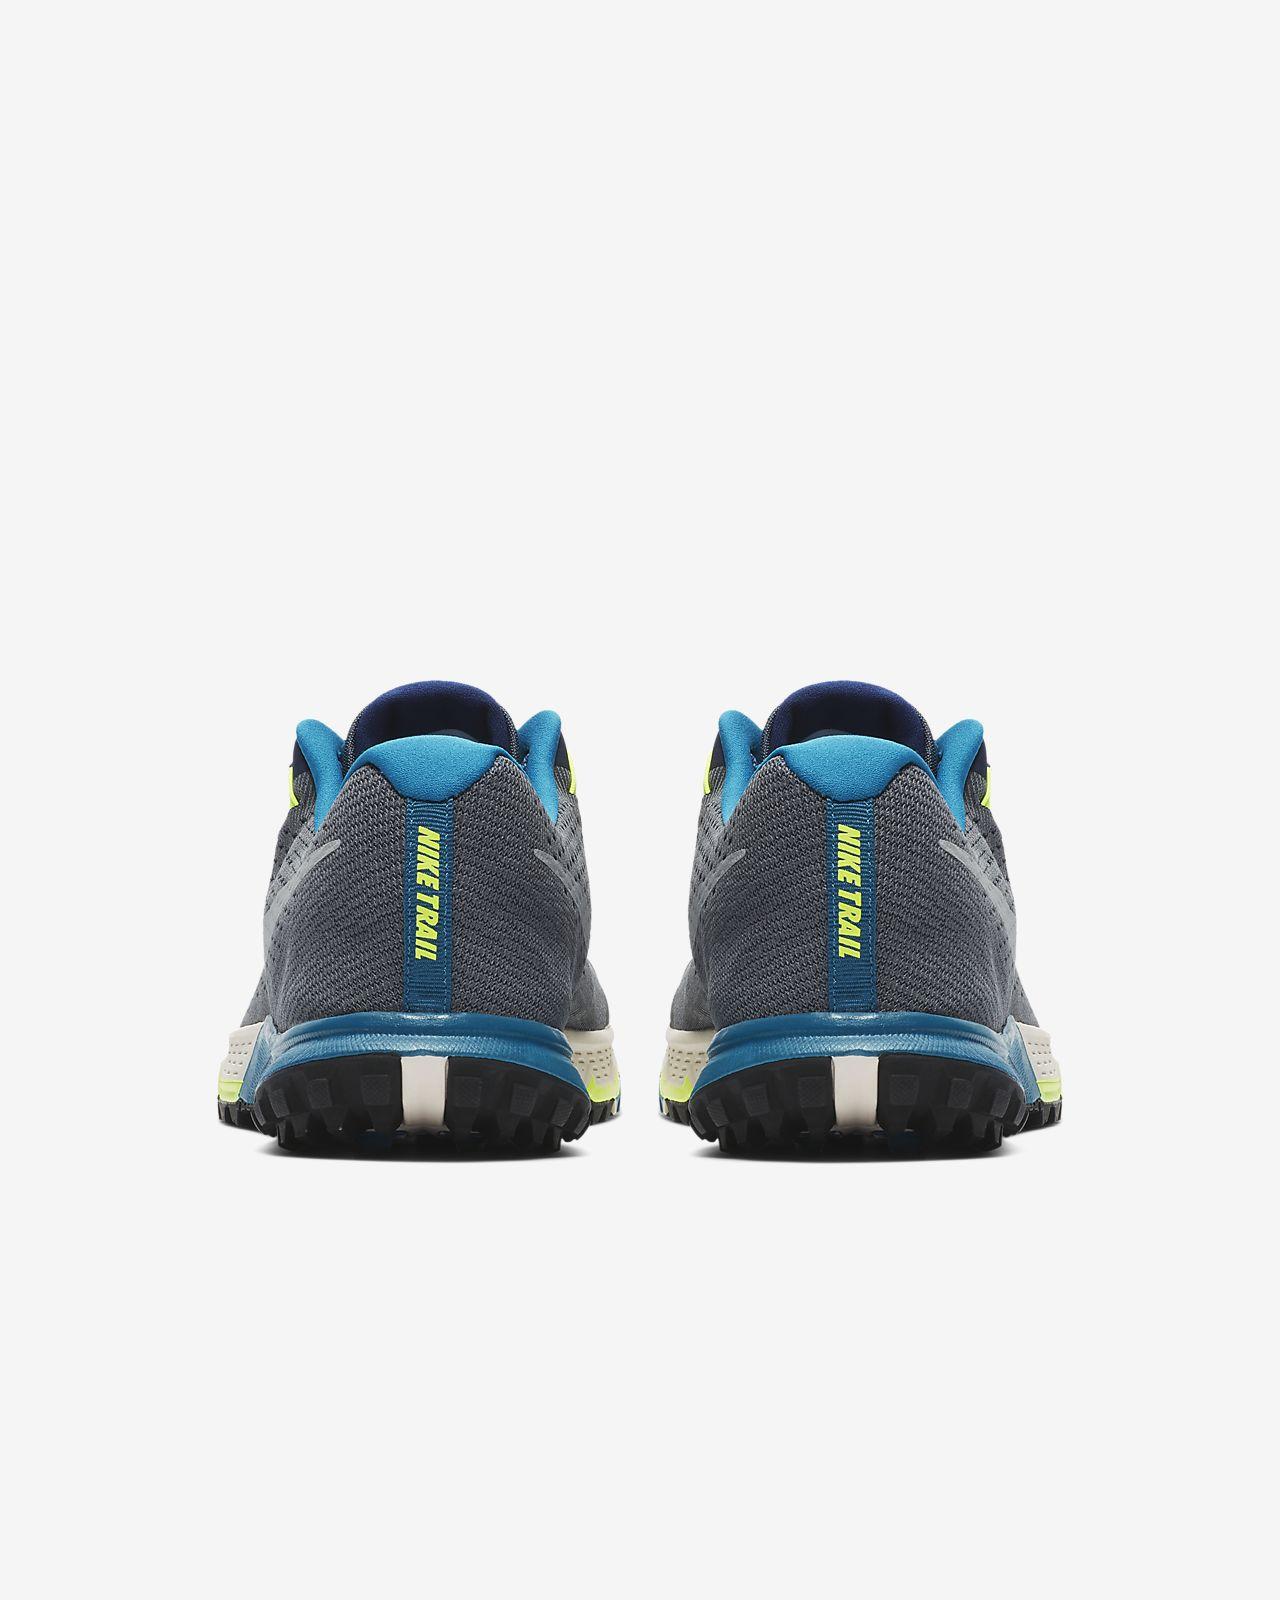 reputable site 24d84 b352c ... Nike Air Zoom Terra Kiger 4 Men s Running Shoe